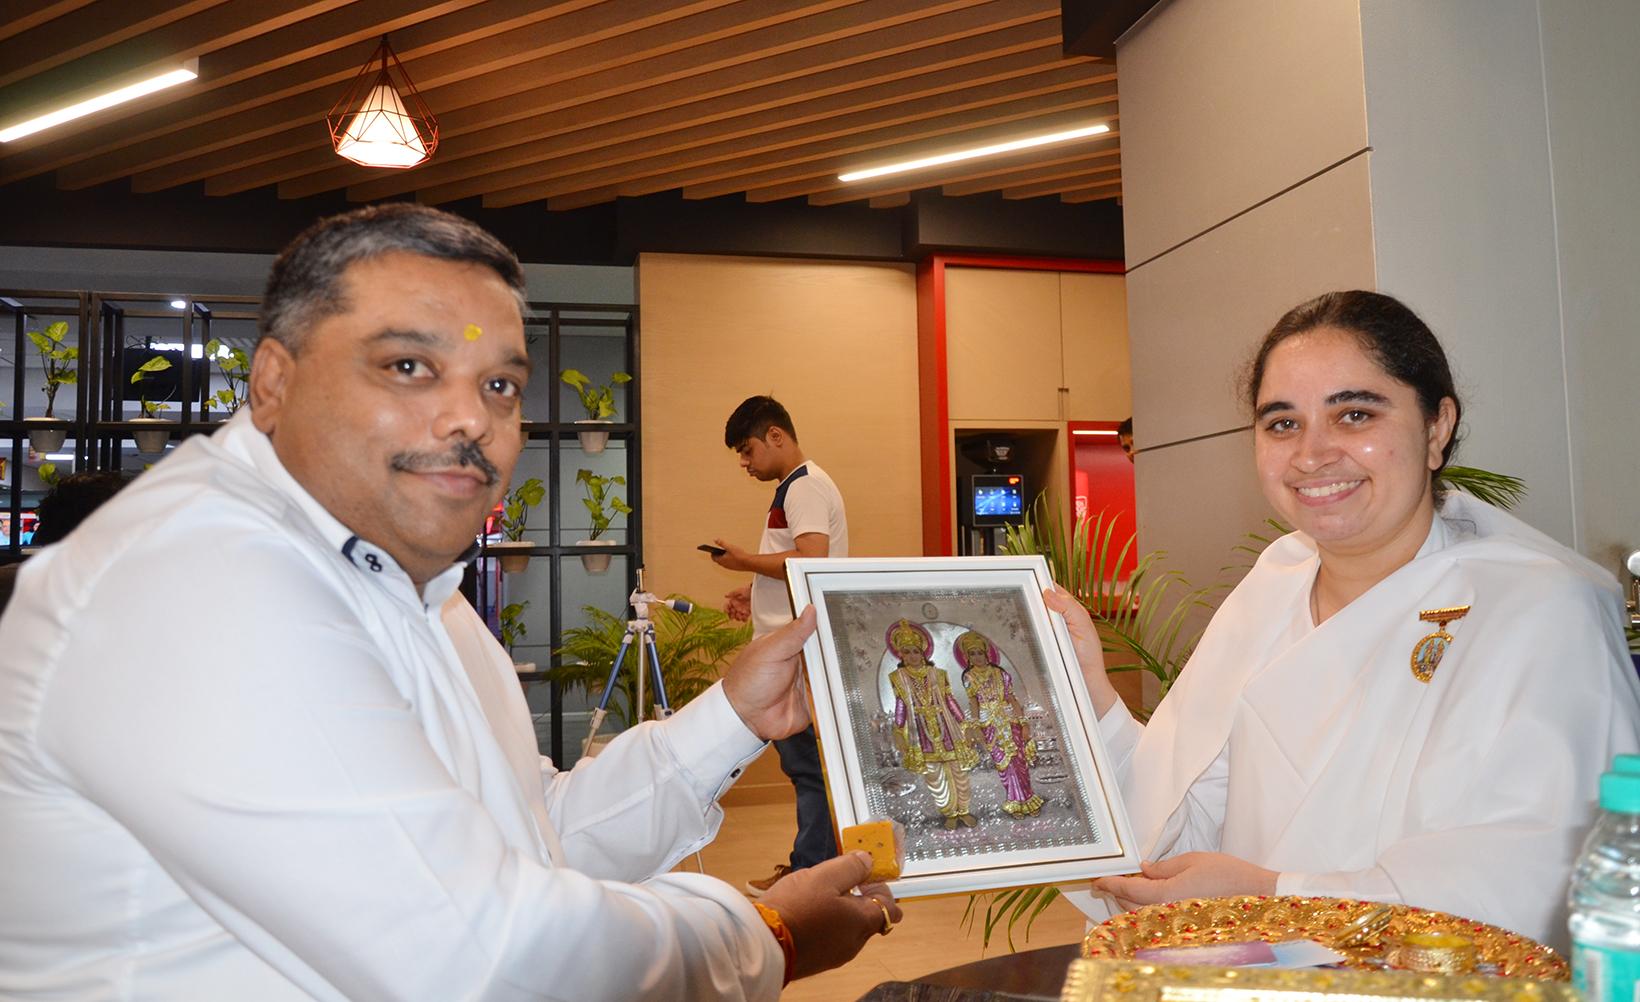 BK Aditi ties Rakhi to Supriya Prasad - Managing Editor Aaj Tak News Channel